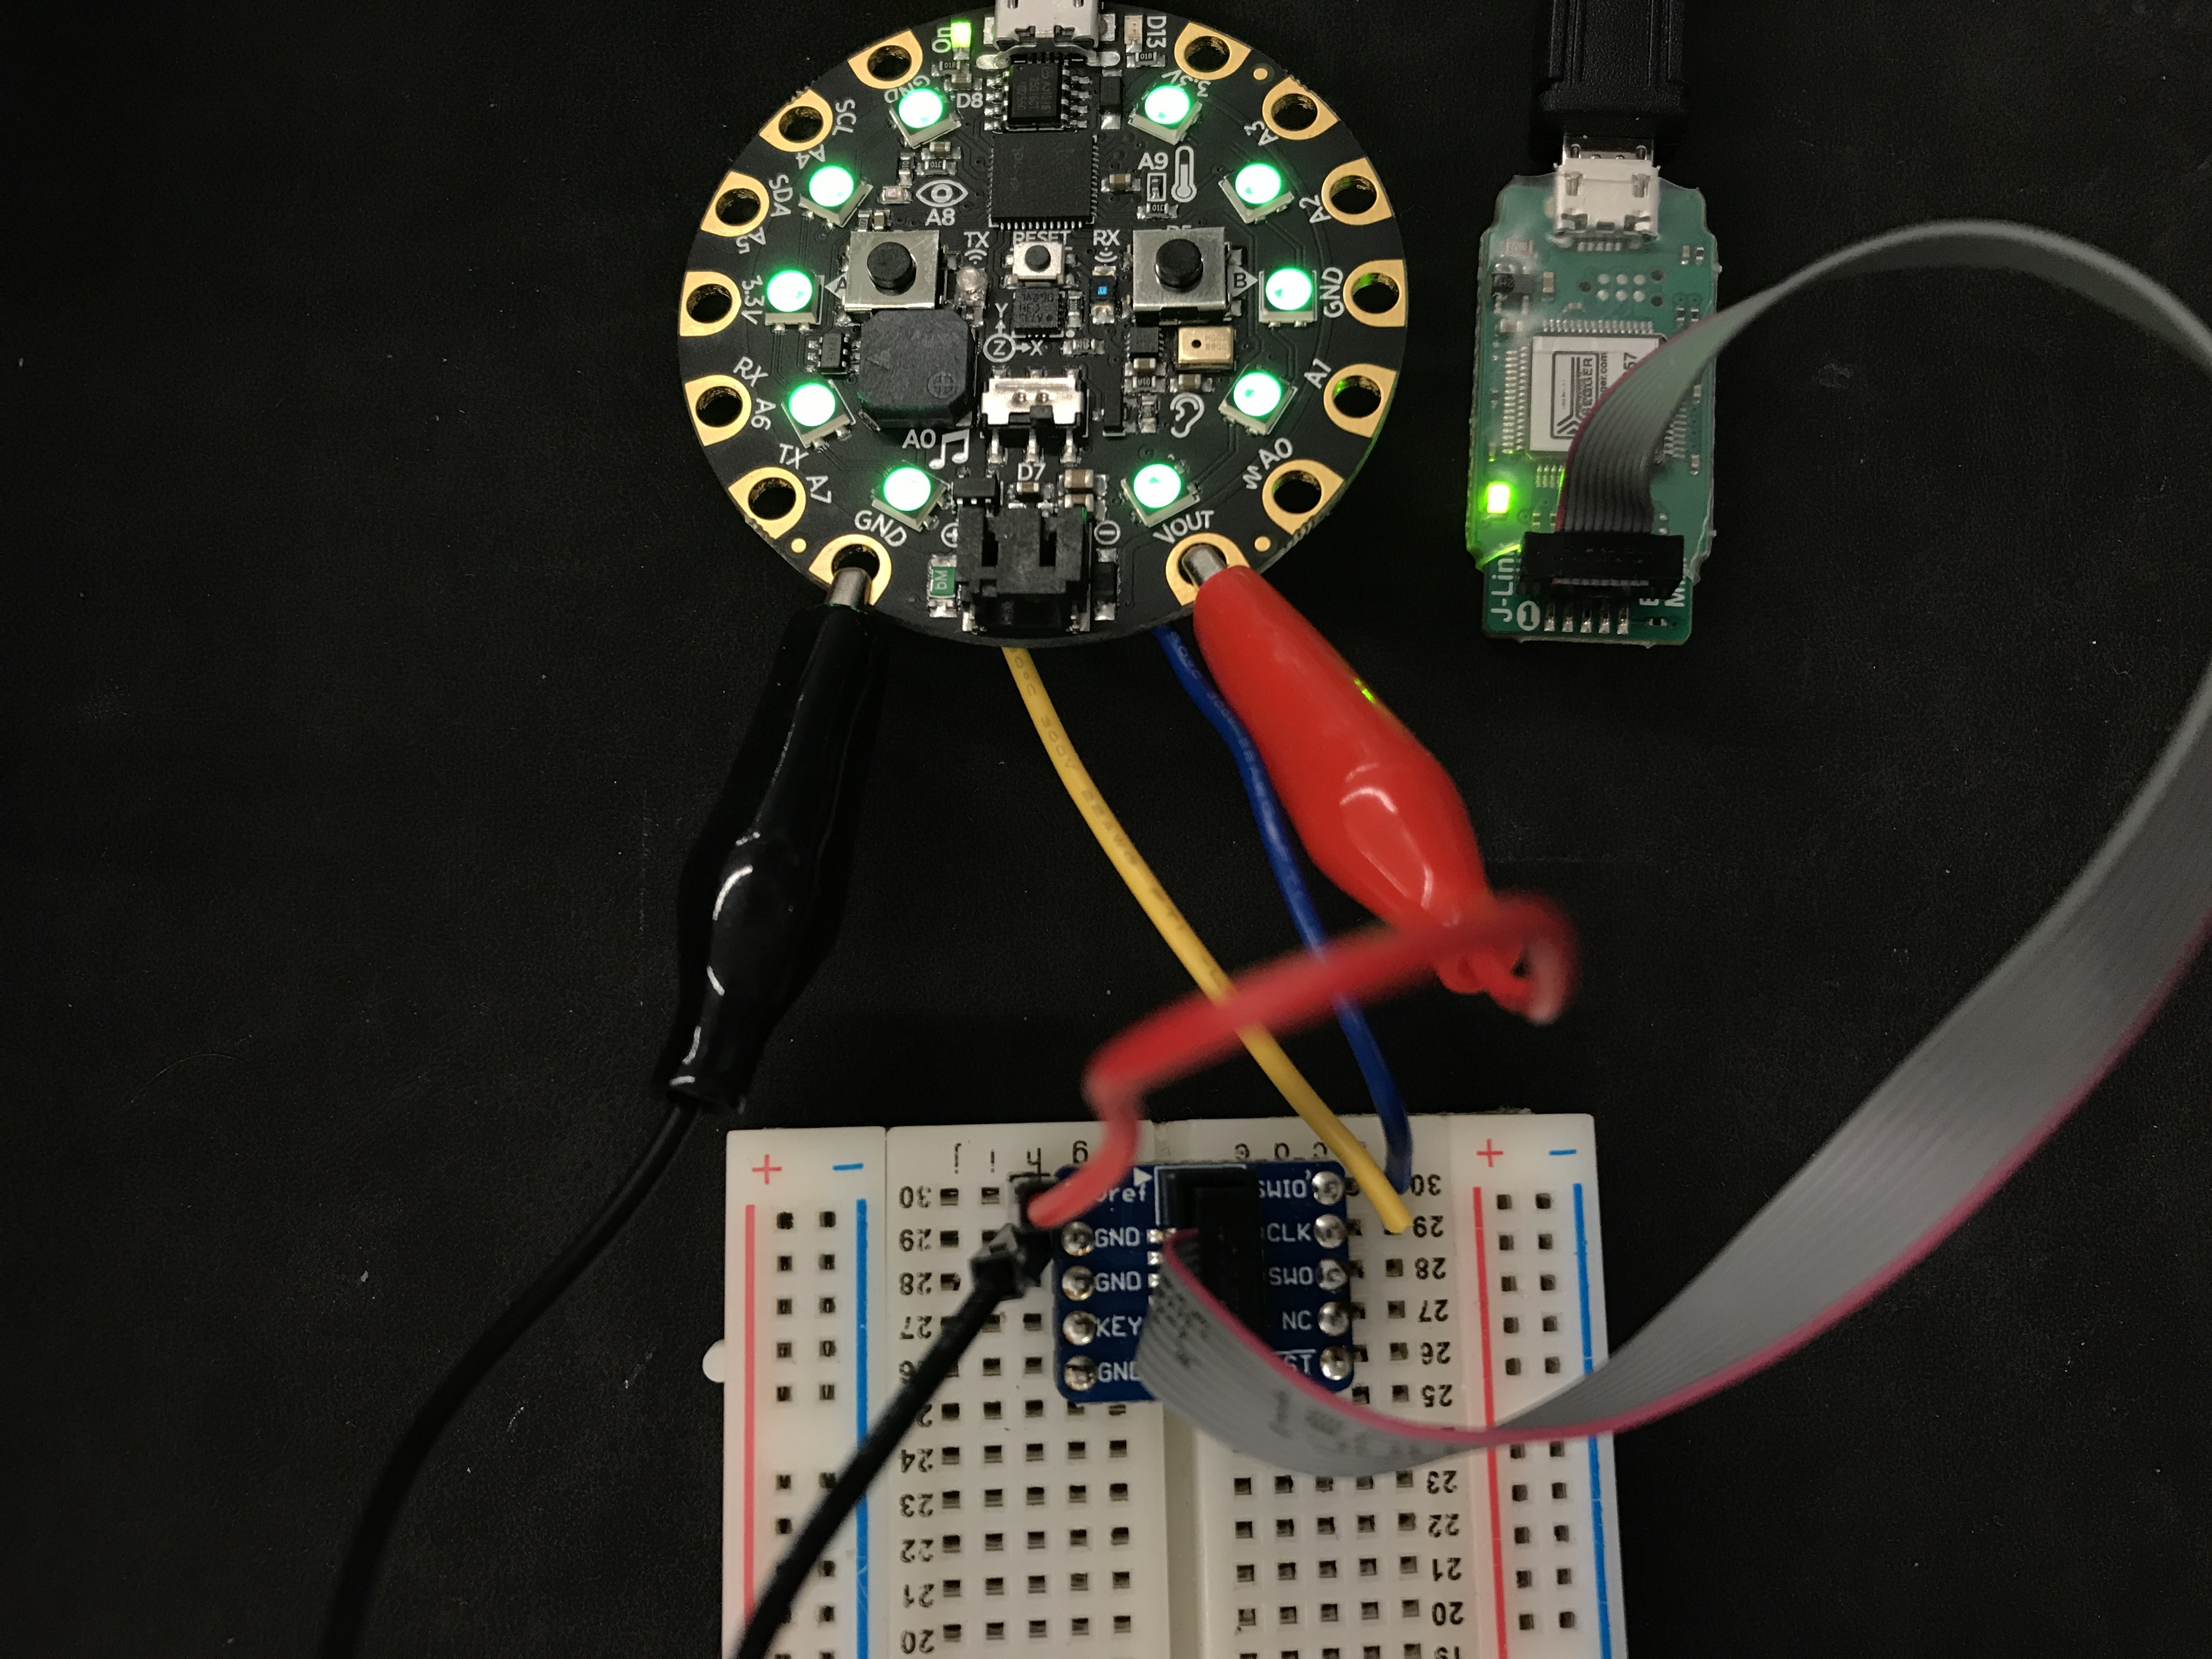 micropython___circuitpython_cpx_setup.jpg